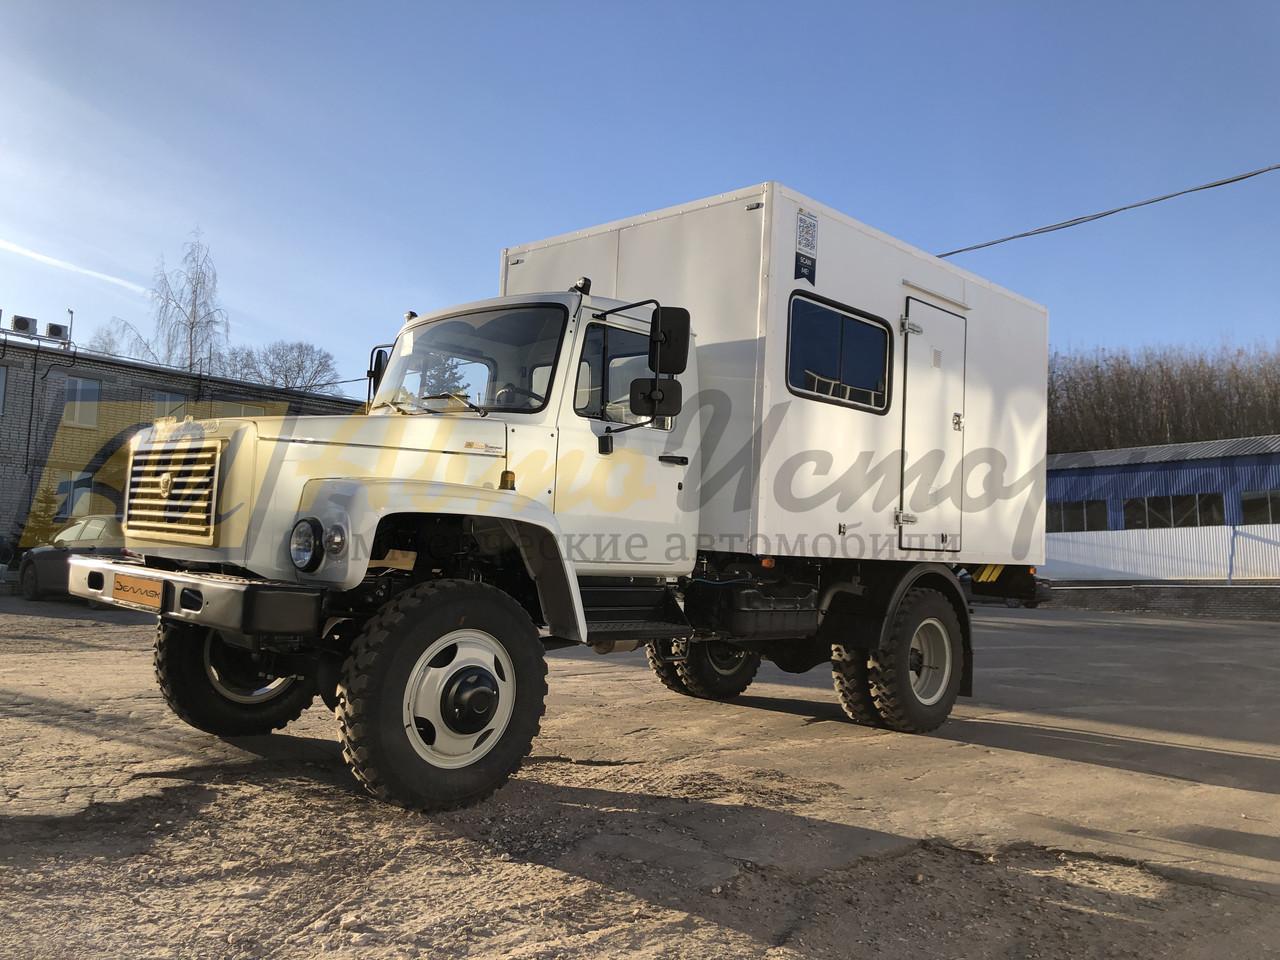 Газ 33086. Фургон - мастерская.